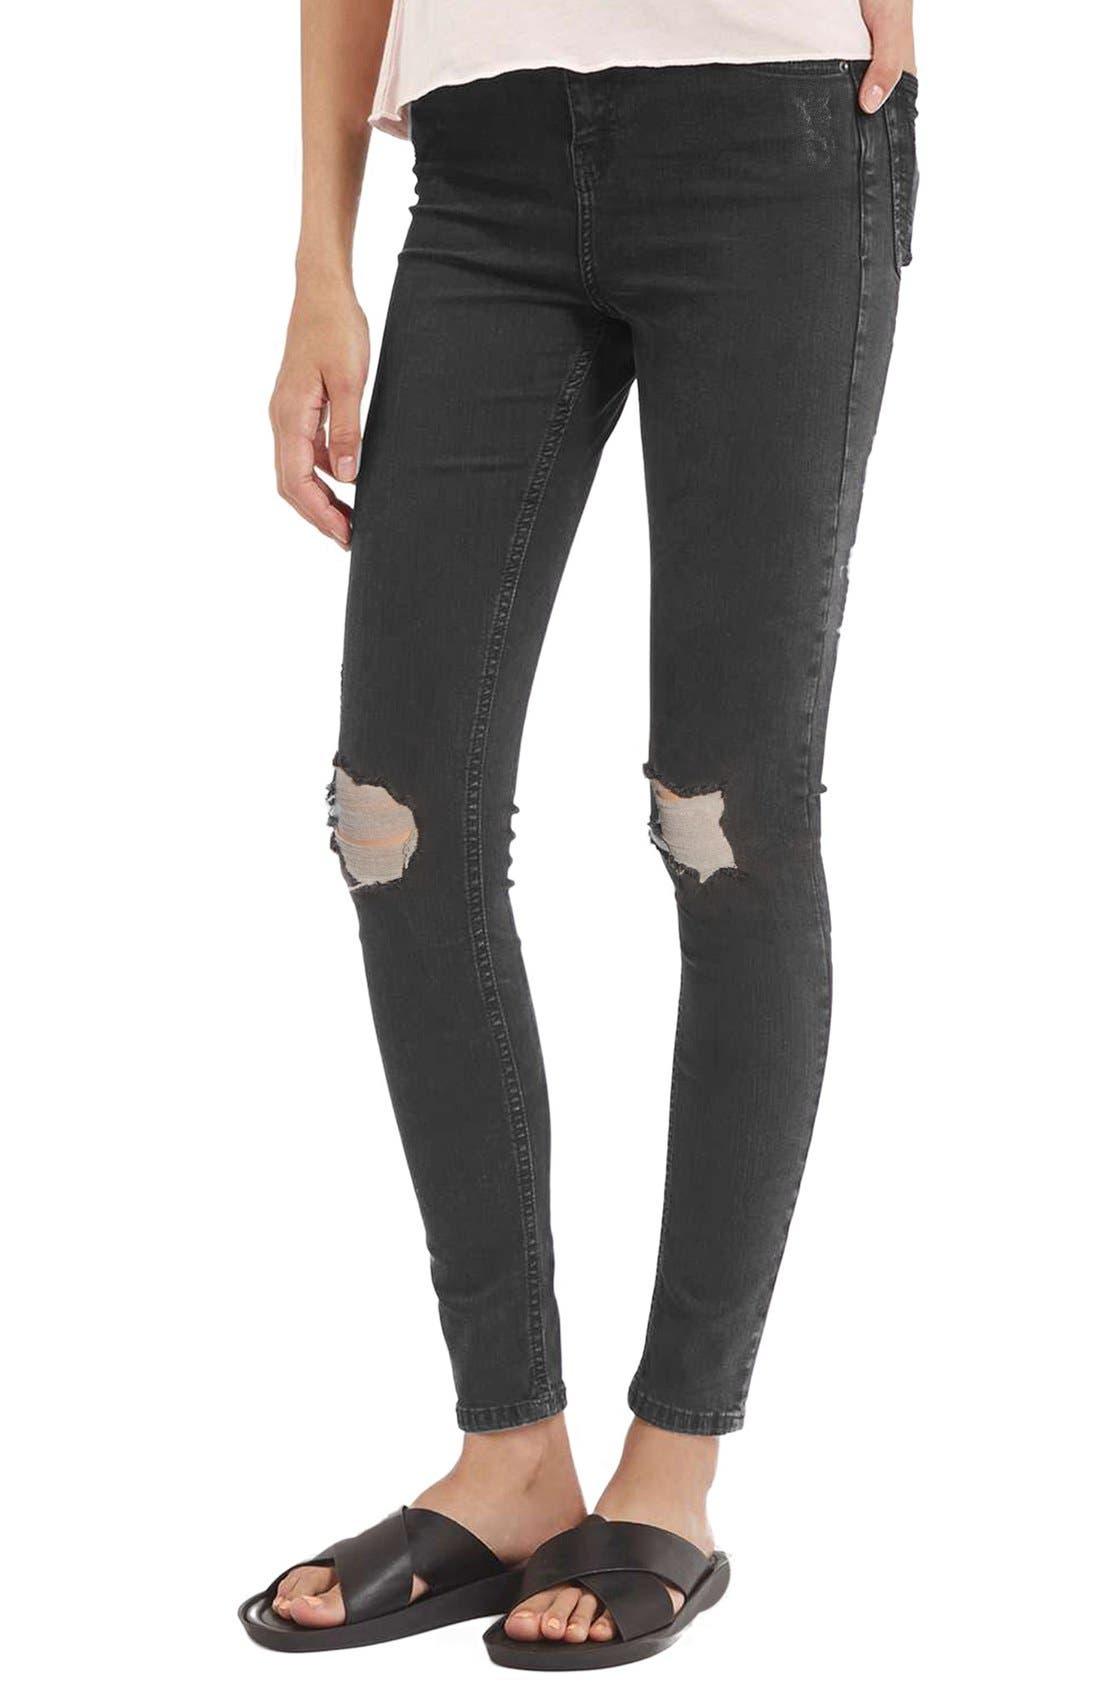 Topshop Jamie Shredded High Waist Skinny Jeans